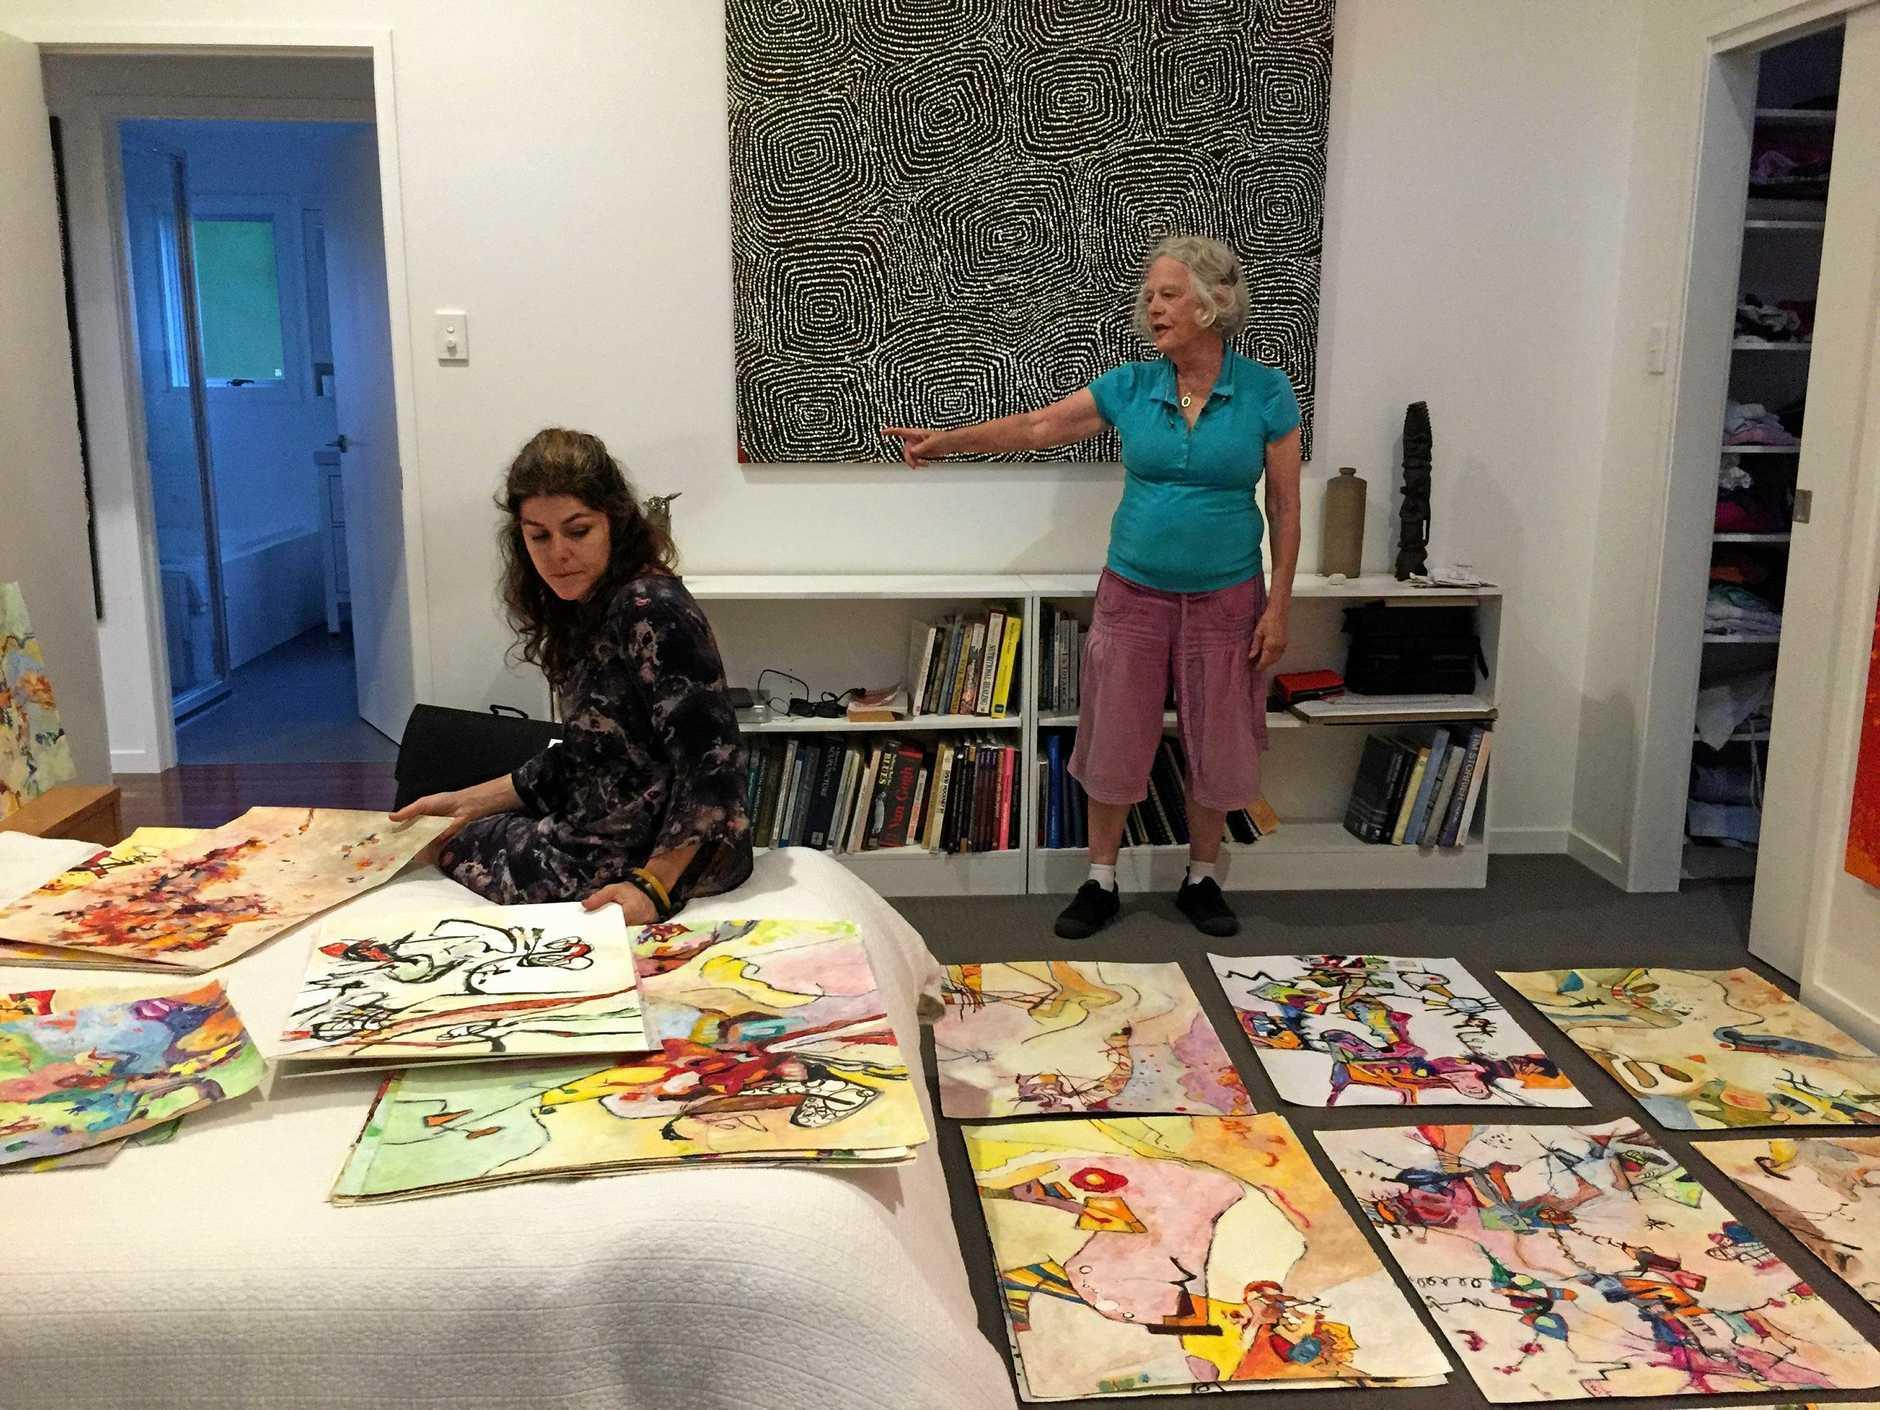 Artist Margaret Builder and Butter Factory Arts Centre coordinator Alicia Sharples consider exhibition options.